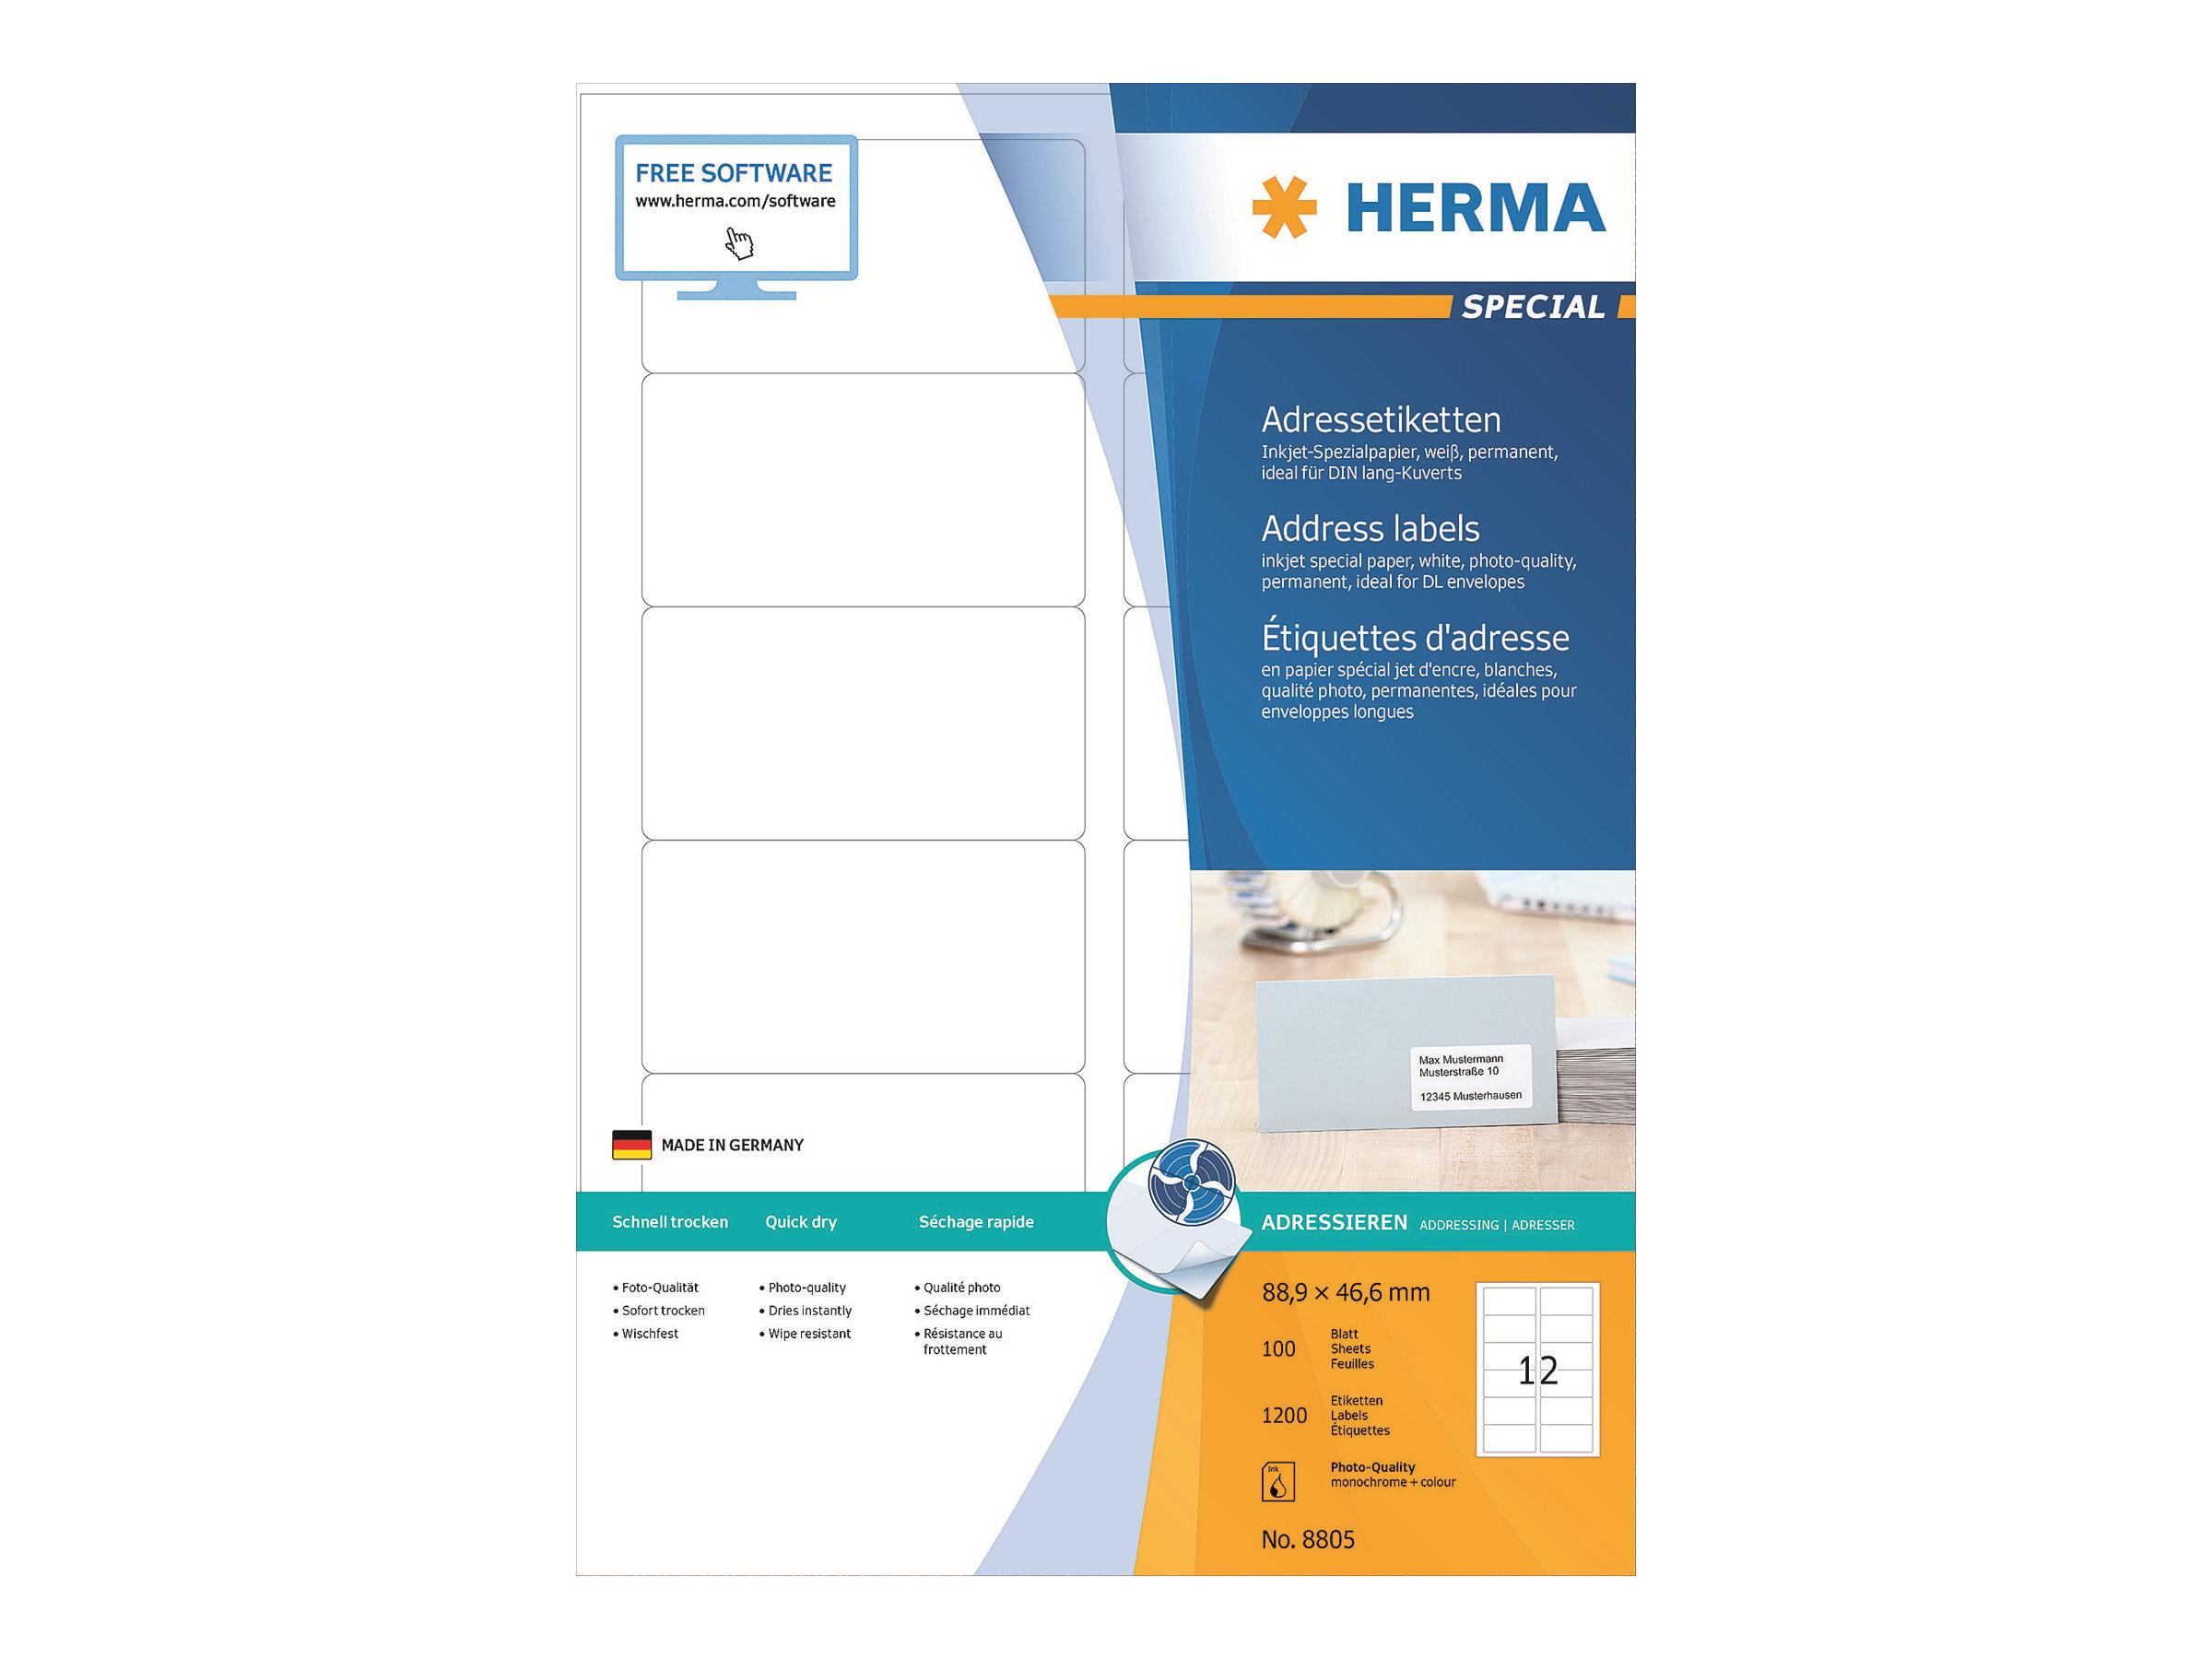 HERMA Special - Papier - matt - permanent selbstklebend - beschichtet - weiß - 88.9 x 46.6 mm - 90 g/m² - 1200 Etikett(en) (100 Bogen x 12)